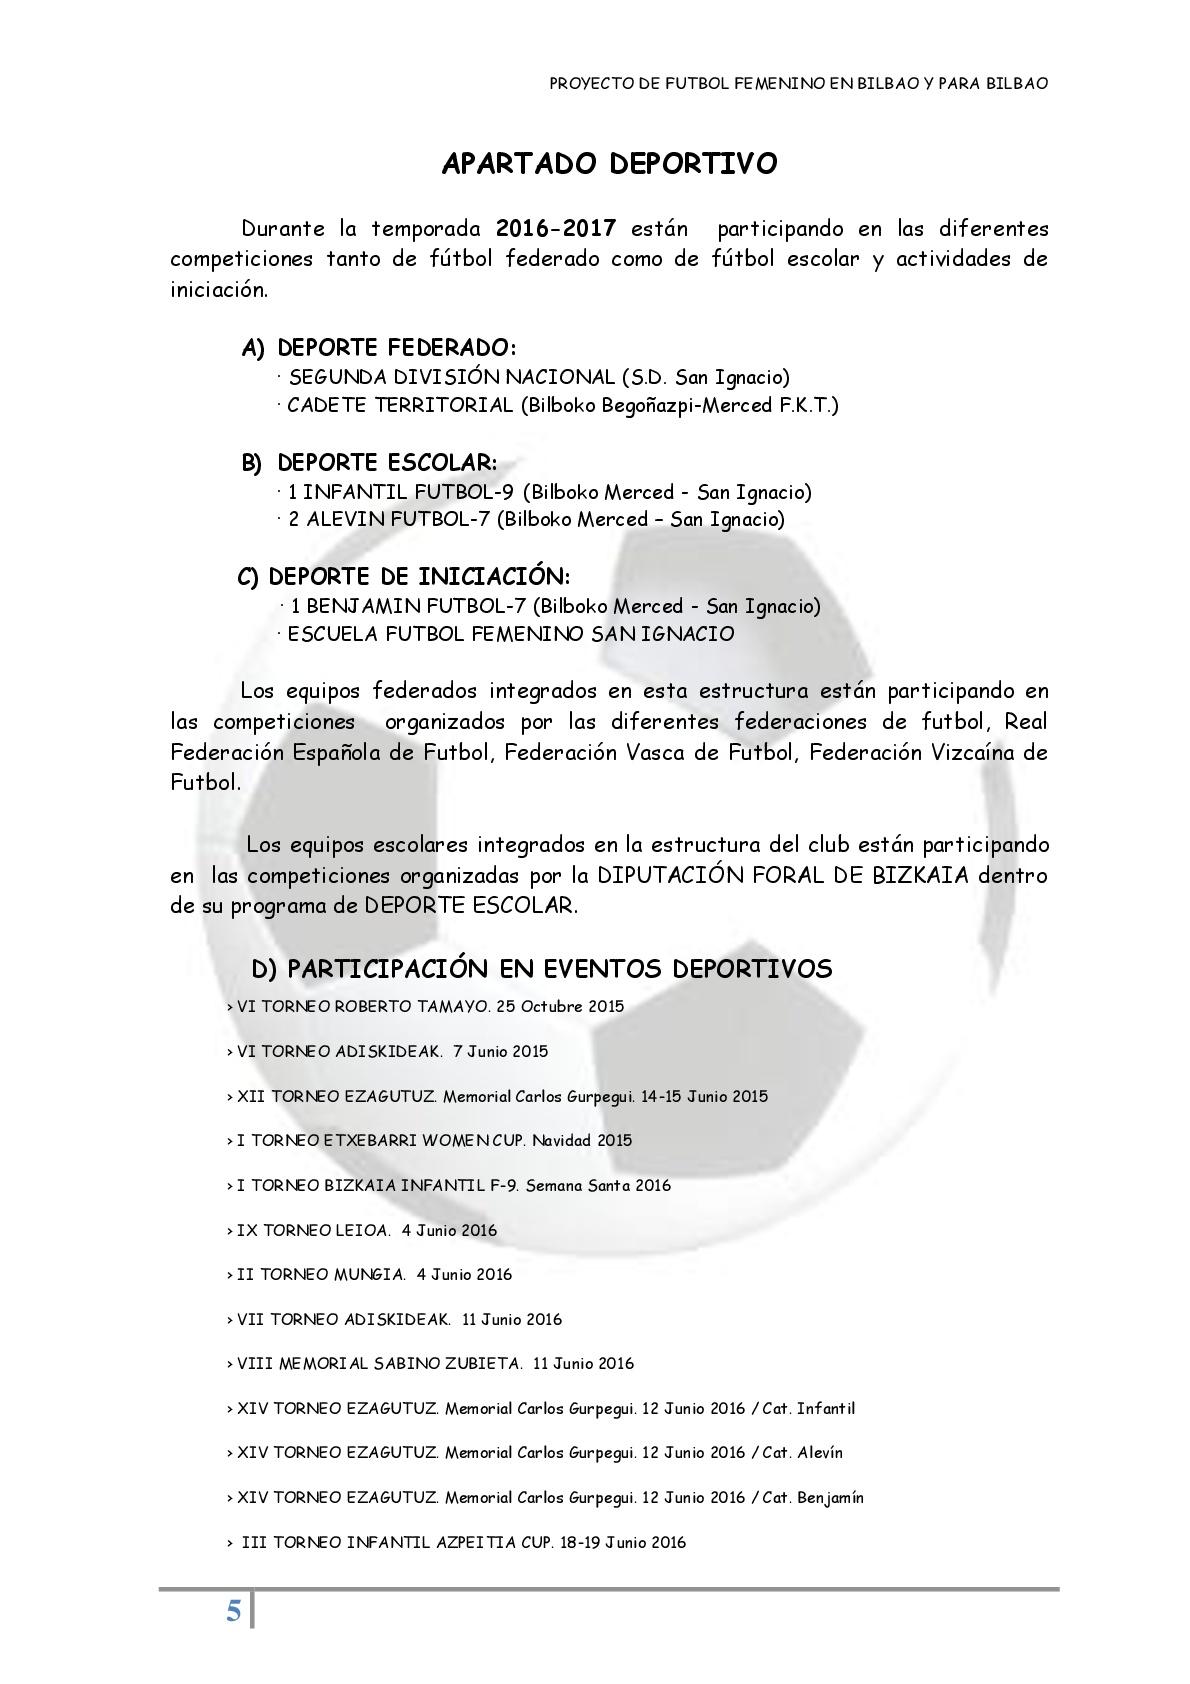 proyecto-futbol-femenino-05-ficha-005